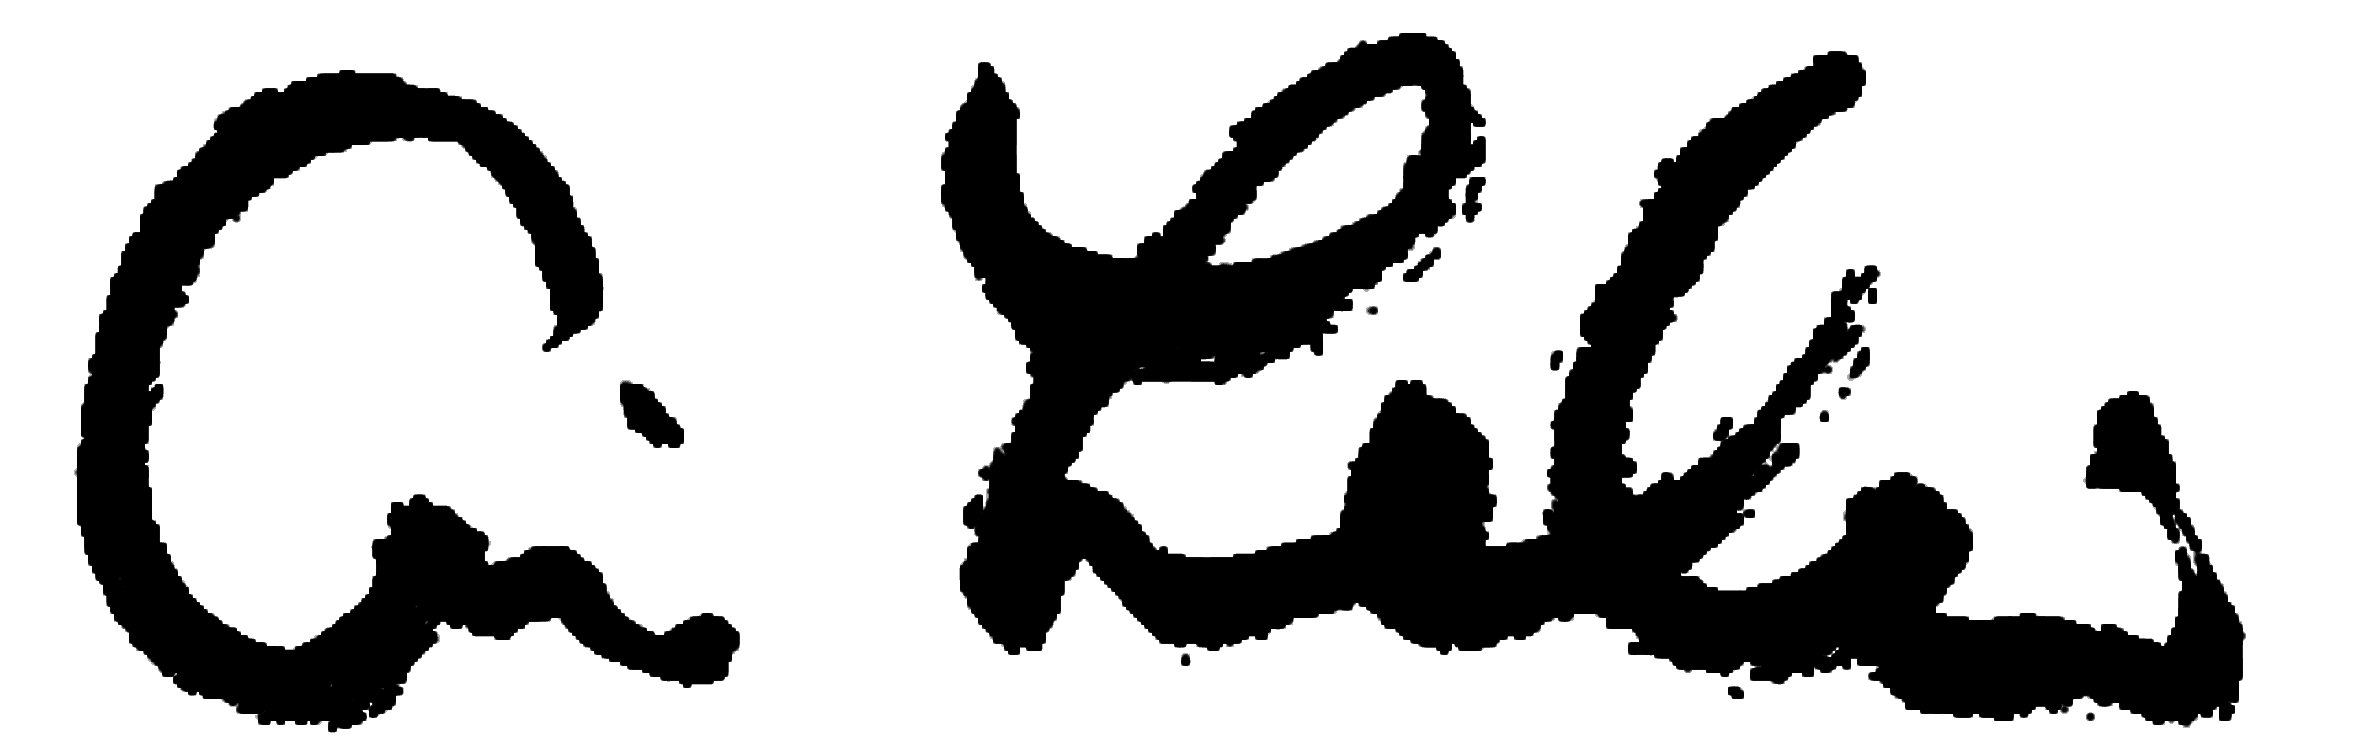 Ari Lankin company logo